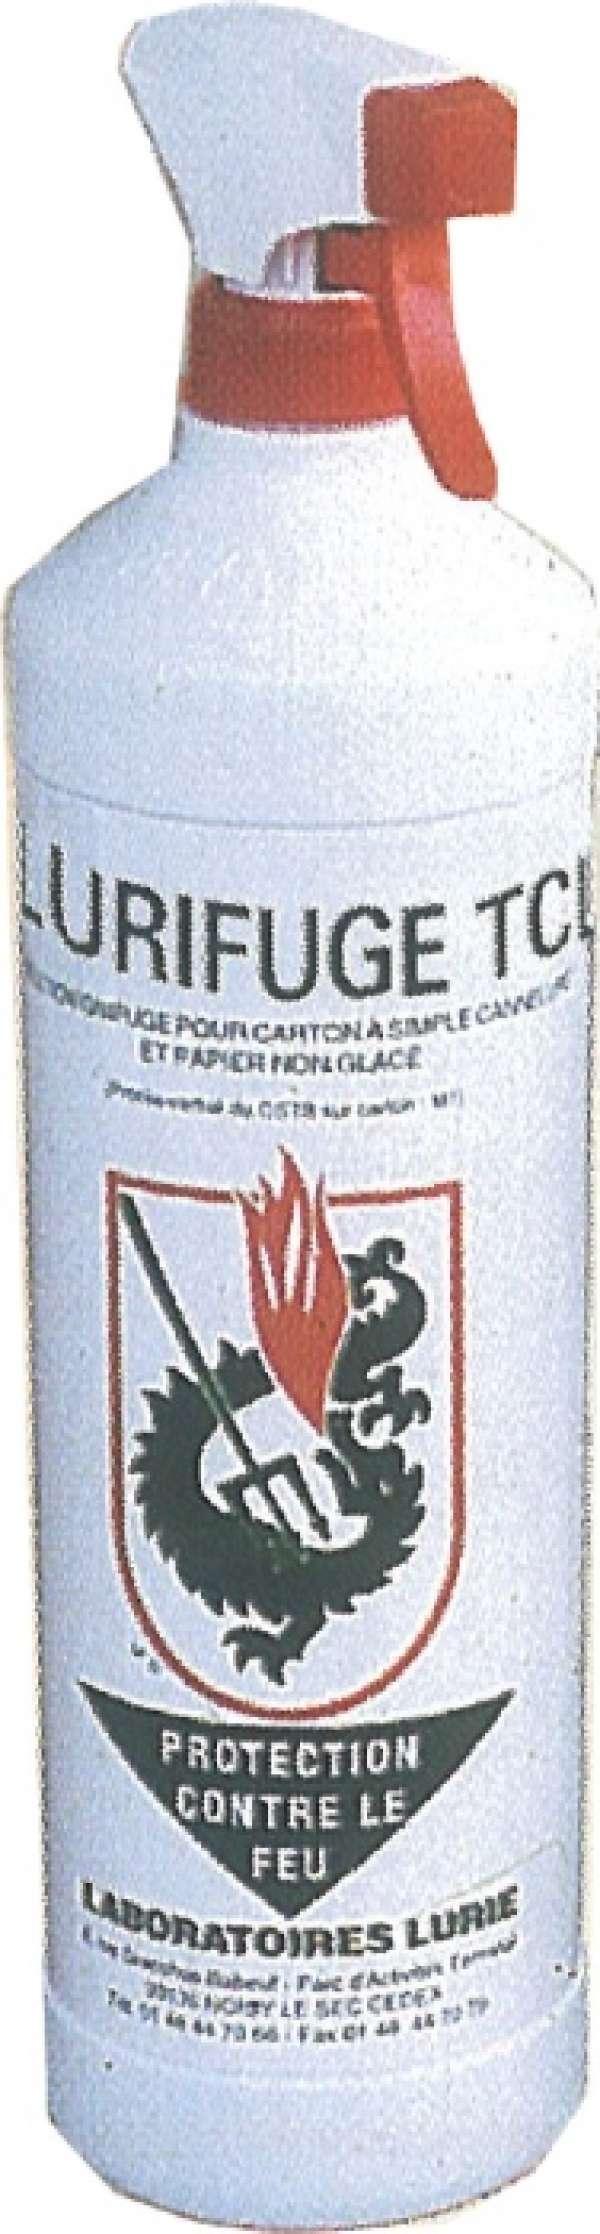 LURIFUGE TCL